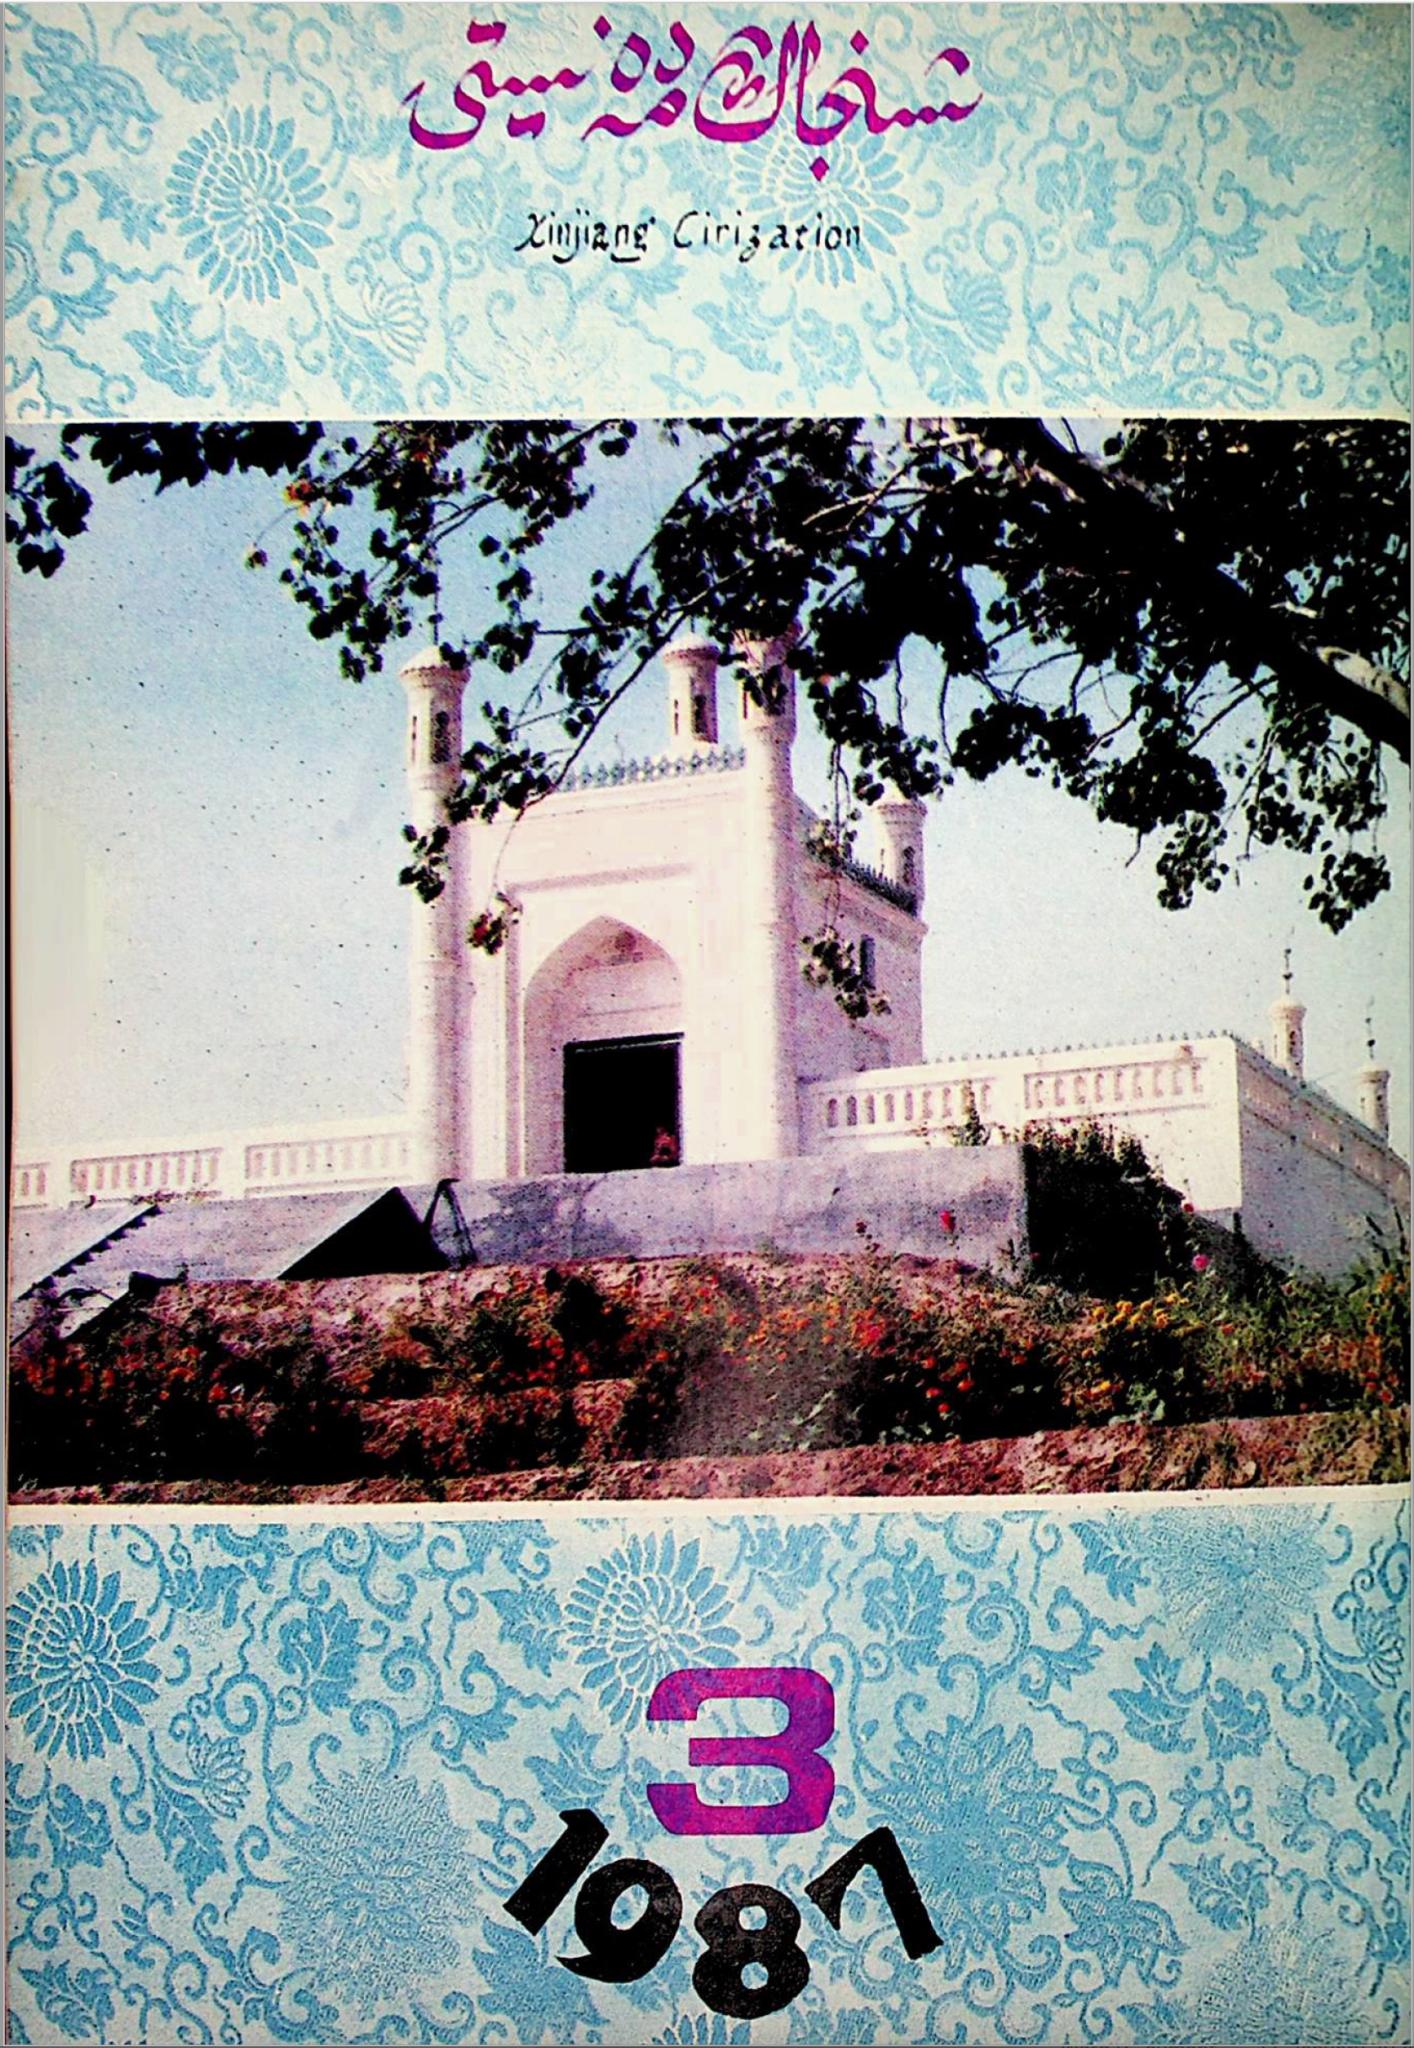 Screenshot 2020 03 08 at 15.20.53 - شىنجاڭ مەدەنىيىتى 1987-يىلى 3-سان